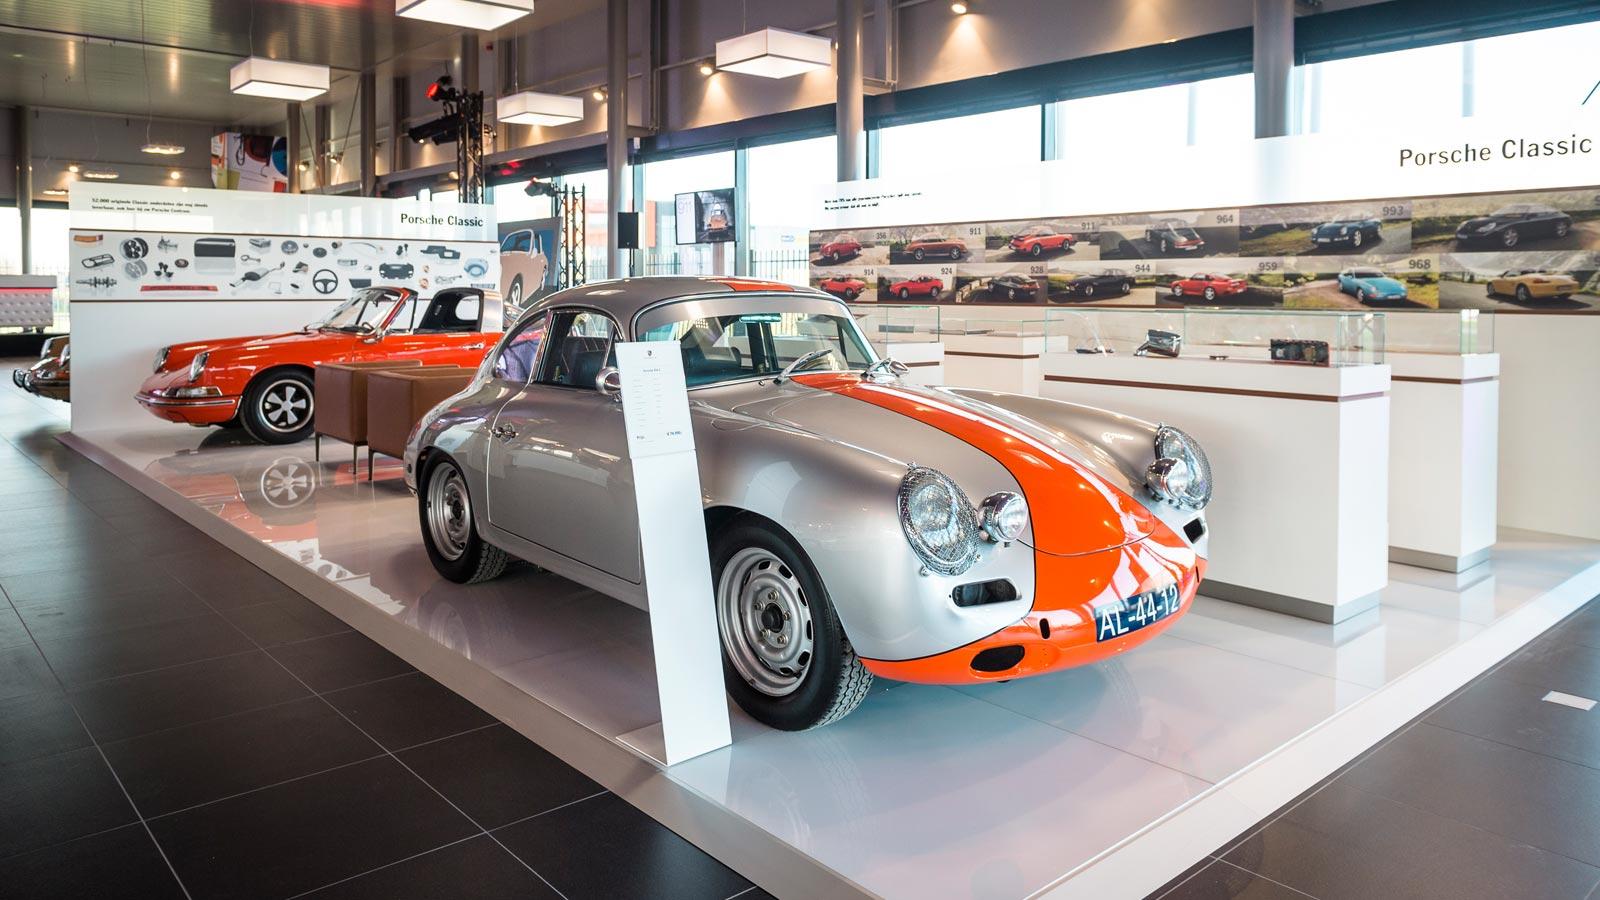 Porsche - Порше Классик Центр Гельдерланд